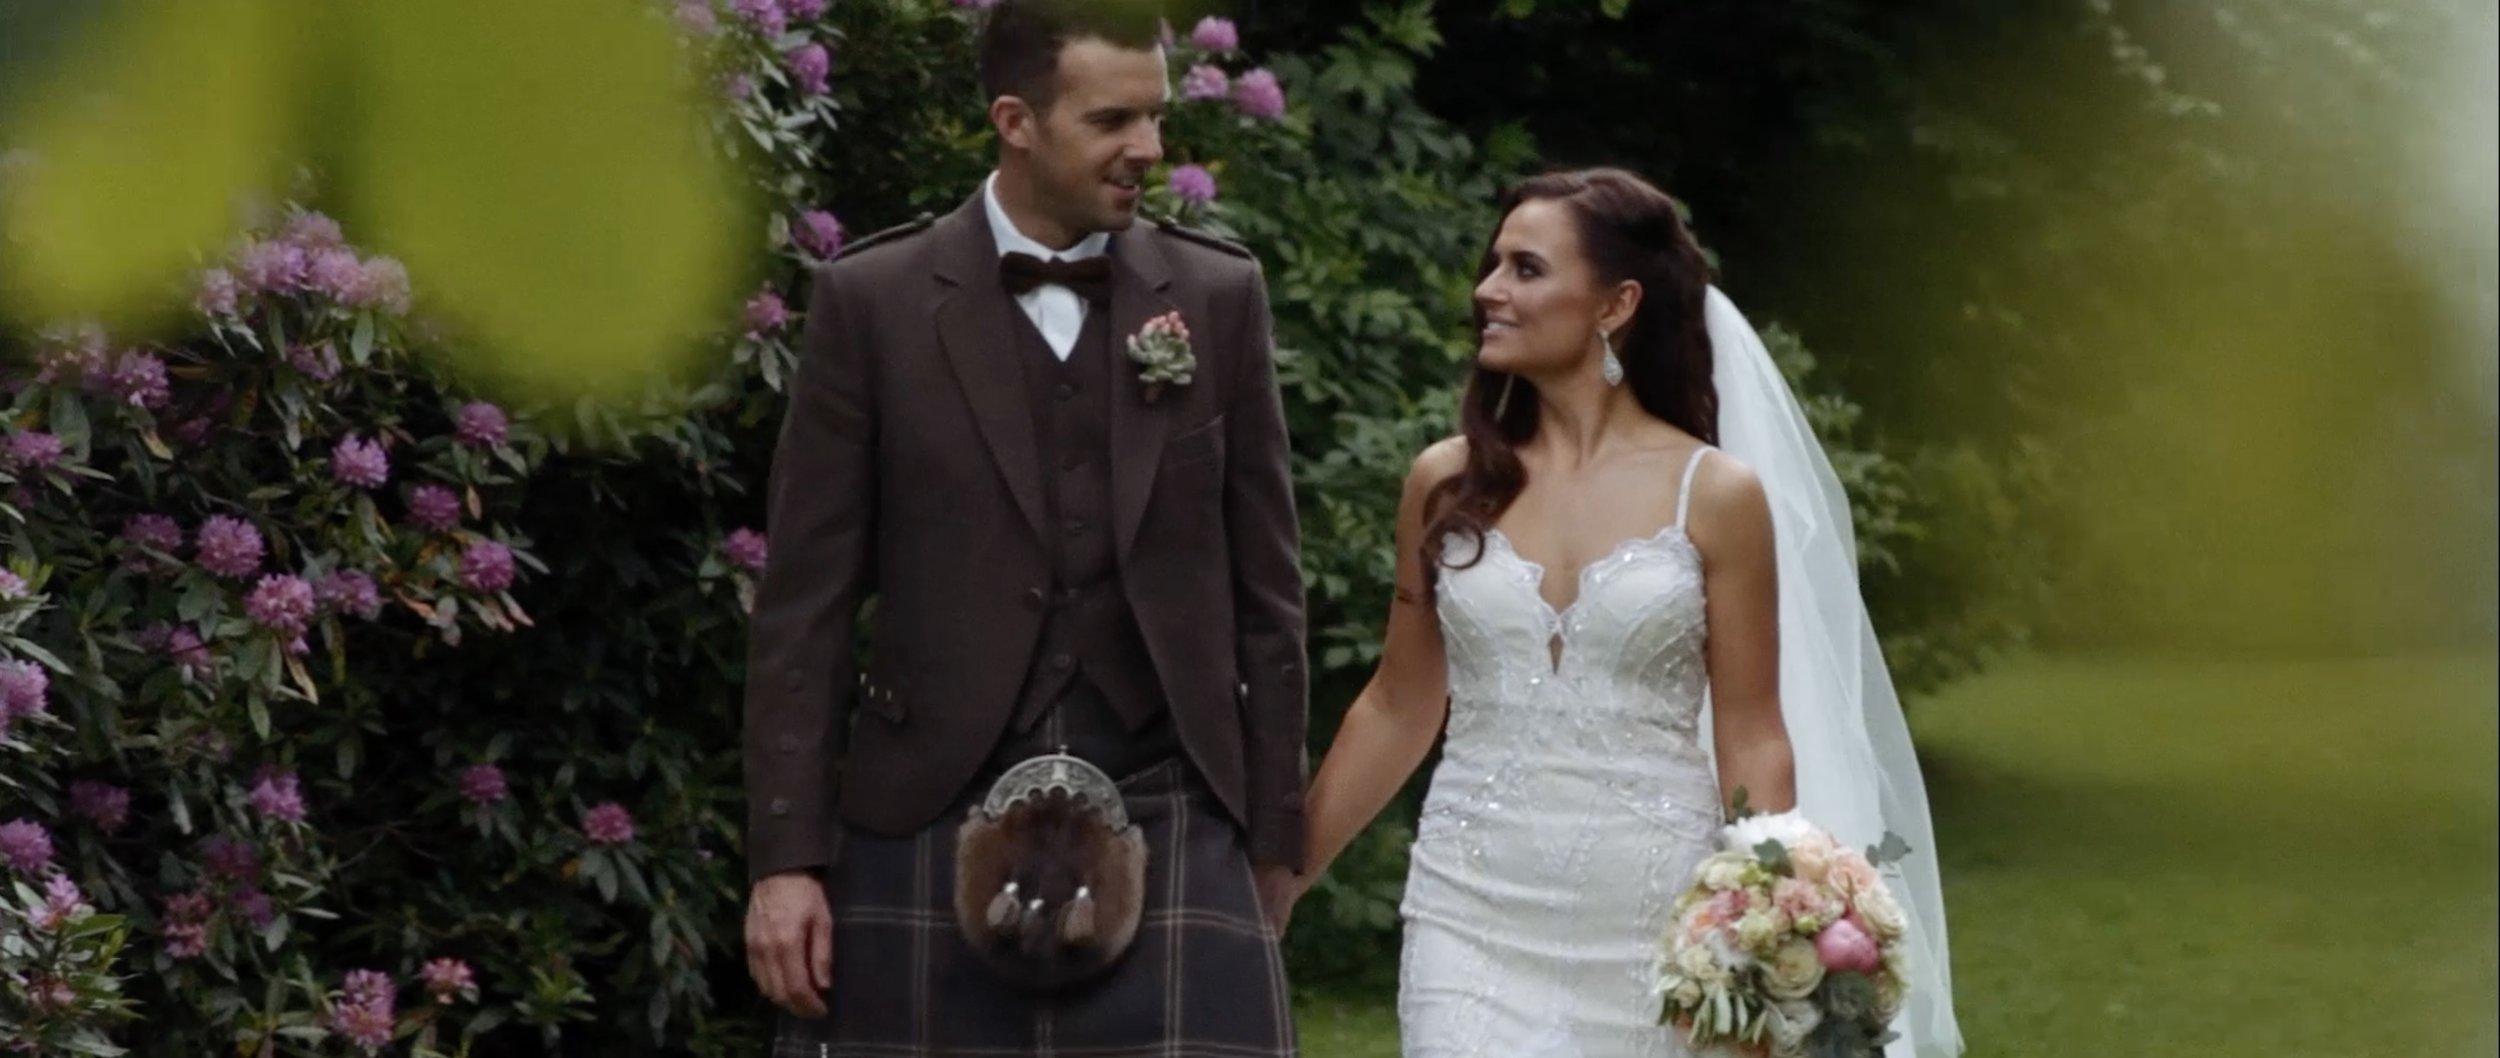 west-on-the-green-wedding-videographer_LL_06.jpg